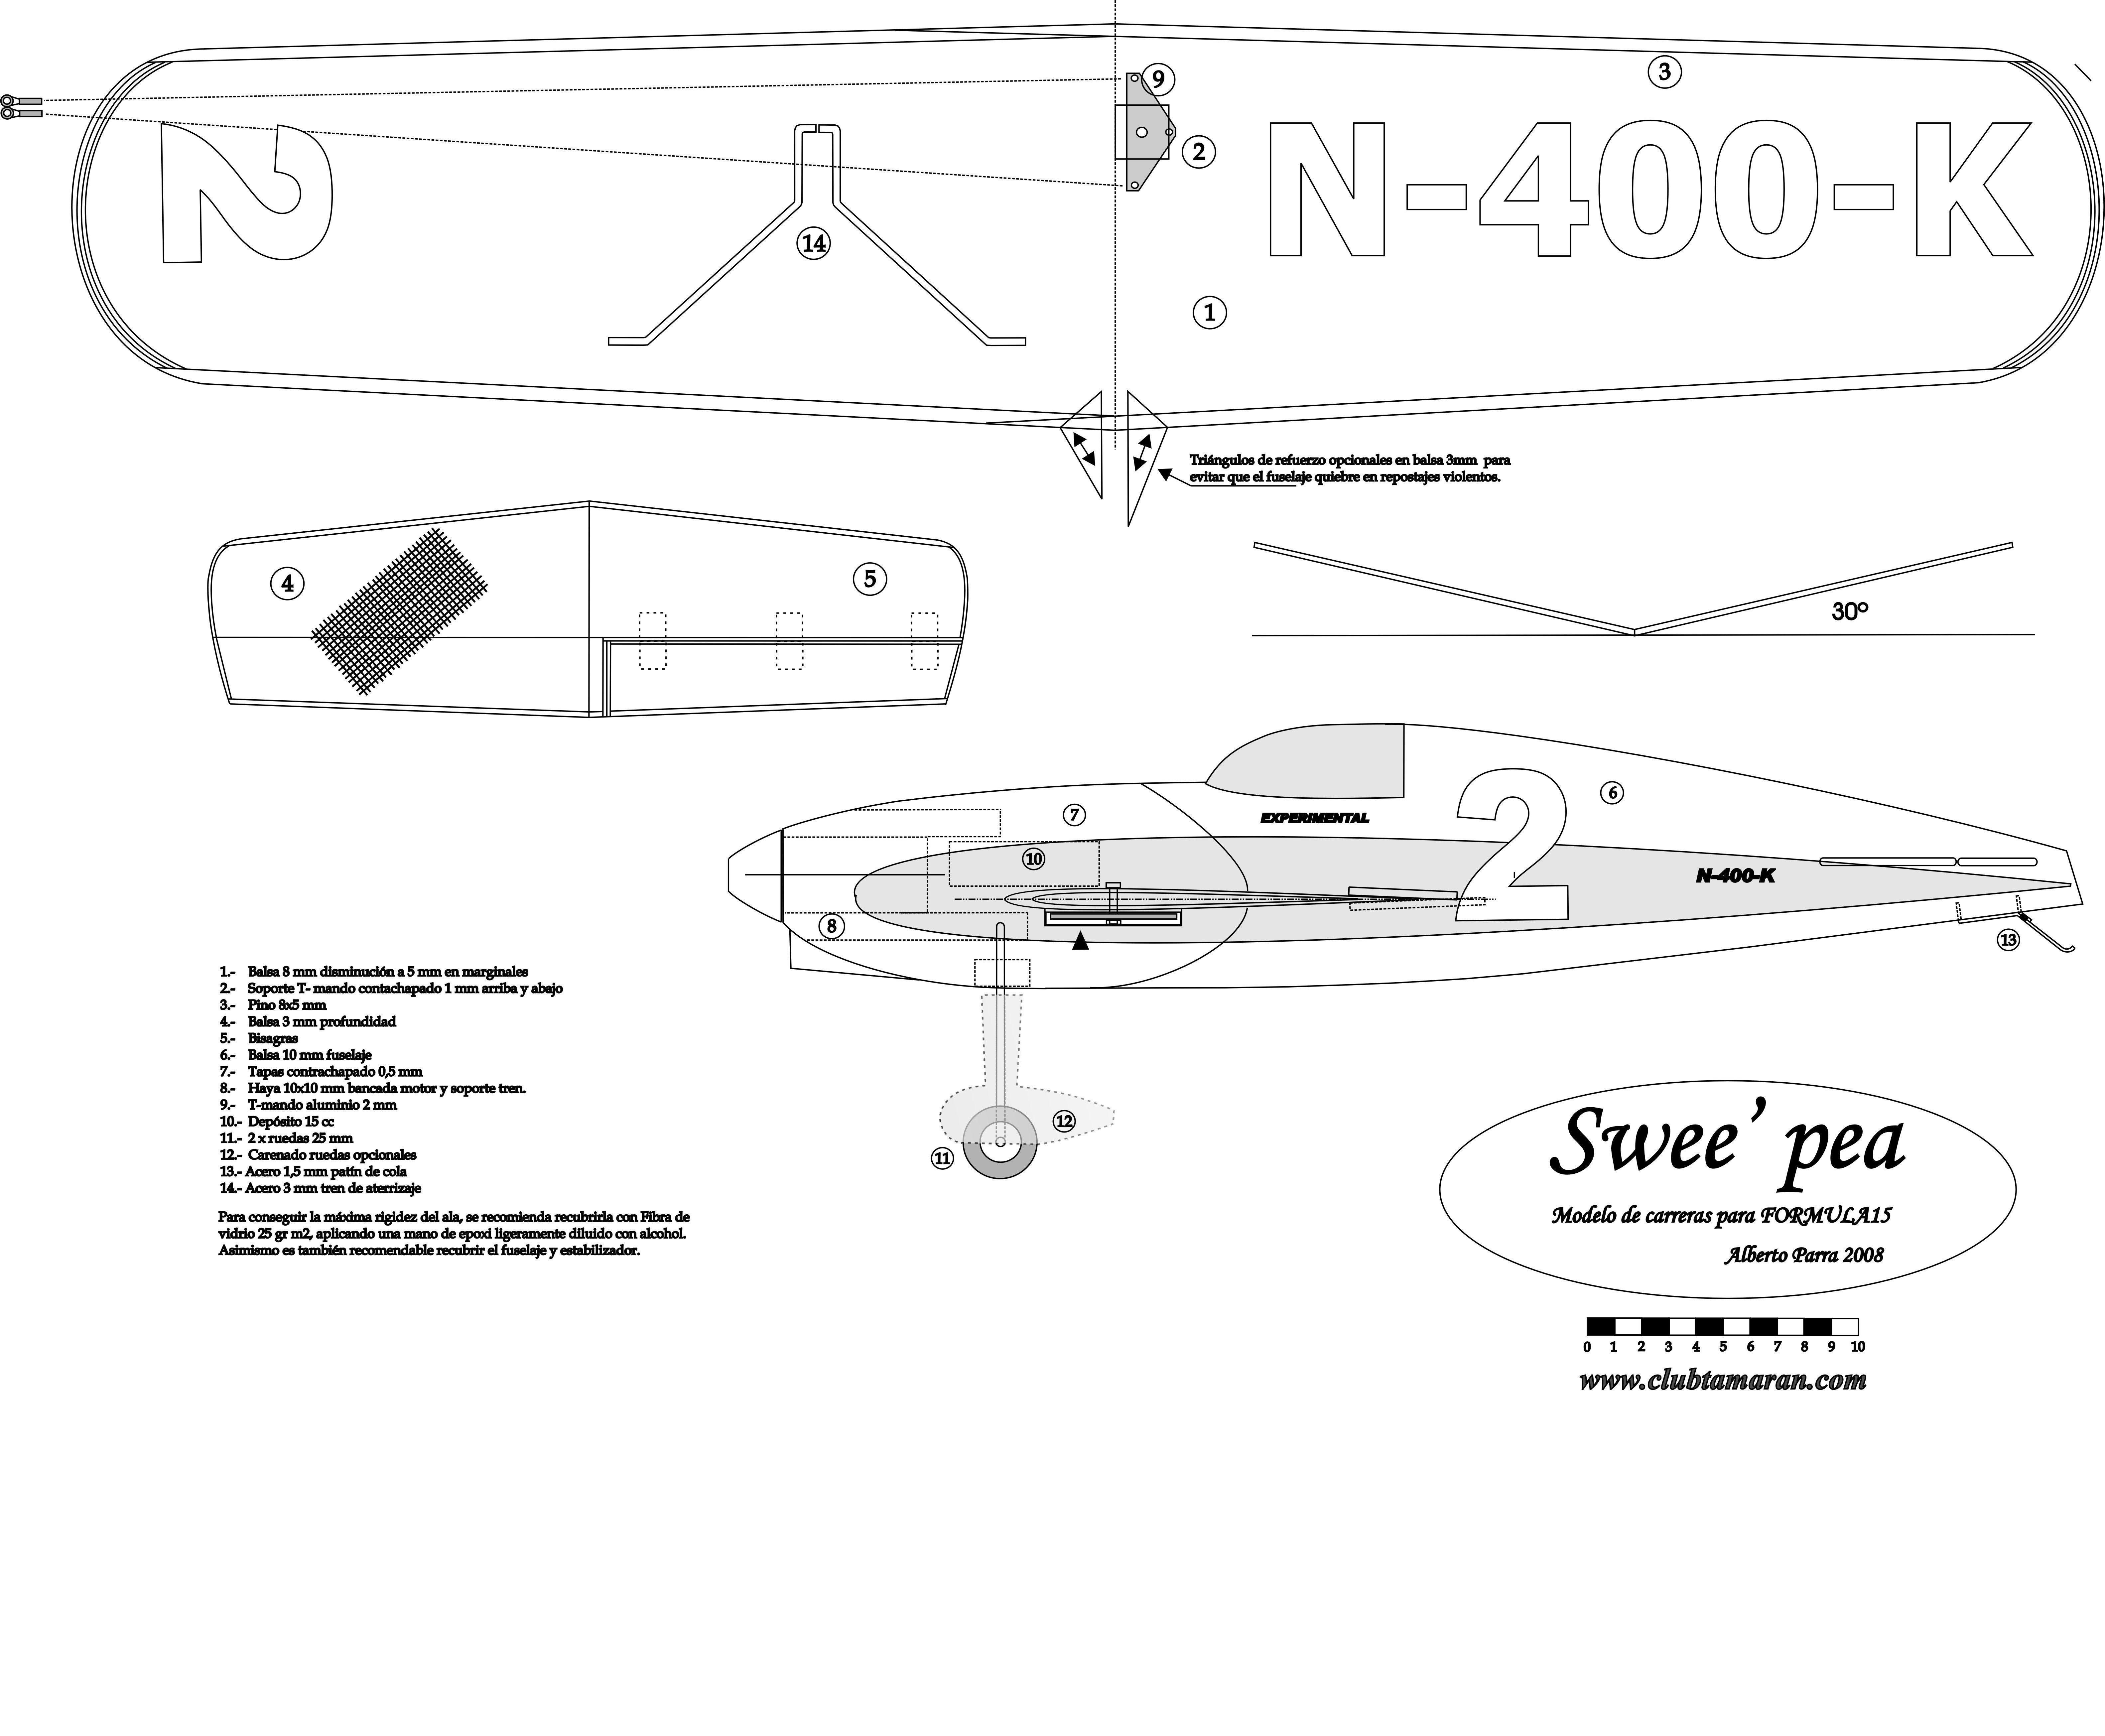 Planos De Aeromodelos Para Descargar I Planos De Hacer Plano A Escala Gratis Planos Gratis Planos Como Hacer Planos